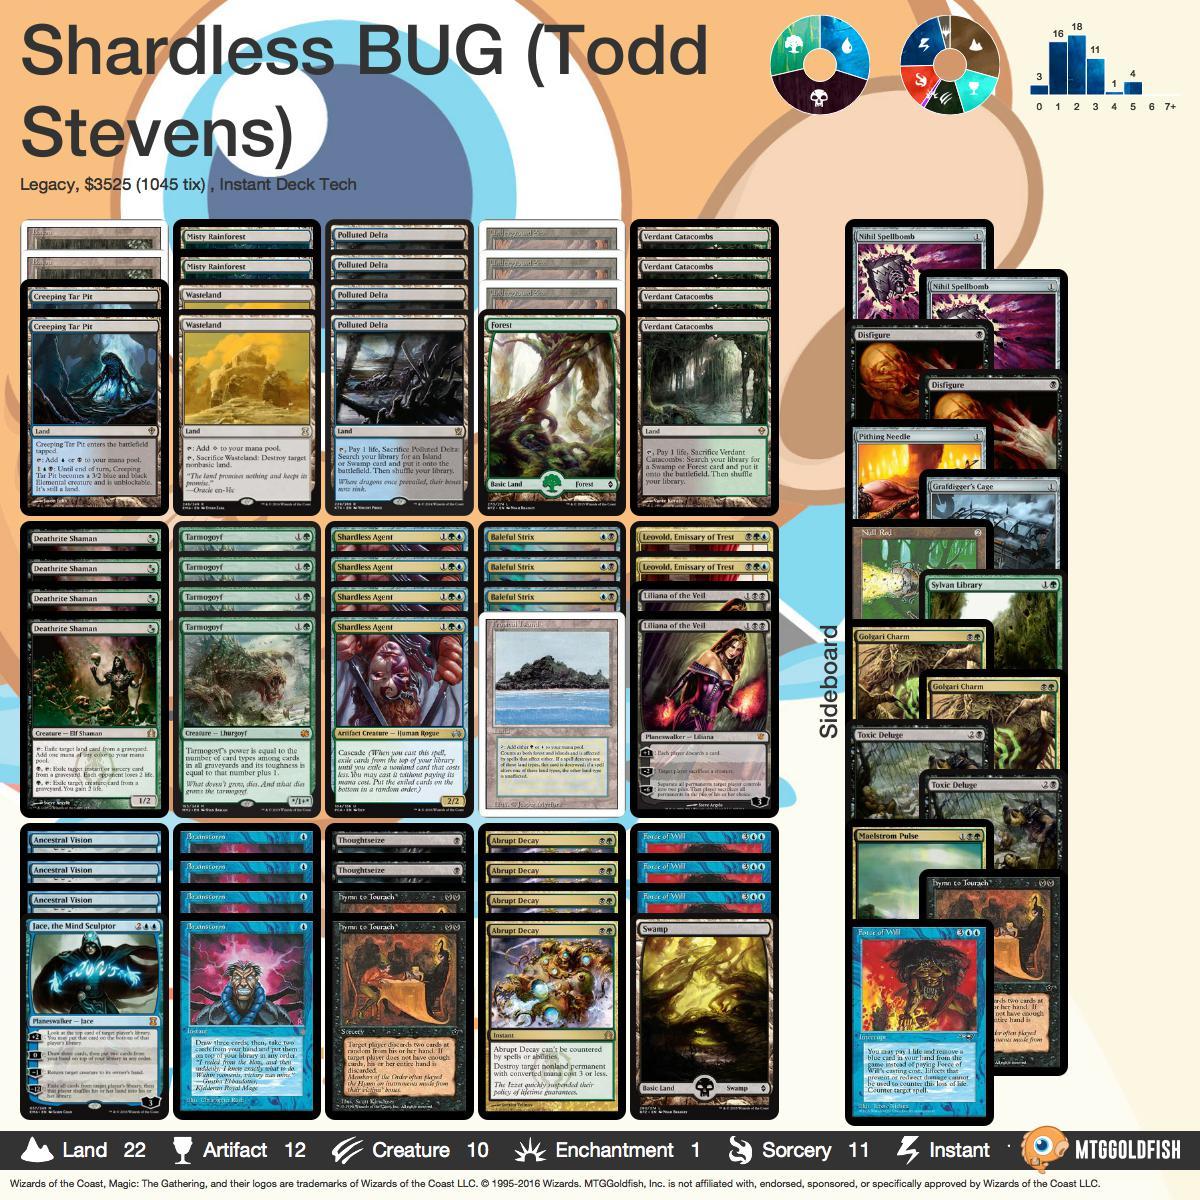 Shardless%2bbug%2b%2528todd%2bstevens%2529 9a427c31 8bf6 4056 a8a9 6053907c53a2%2ejpg